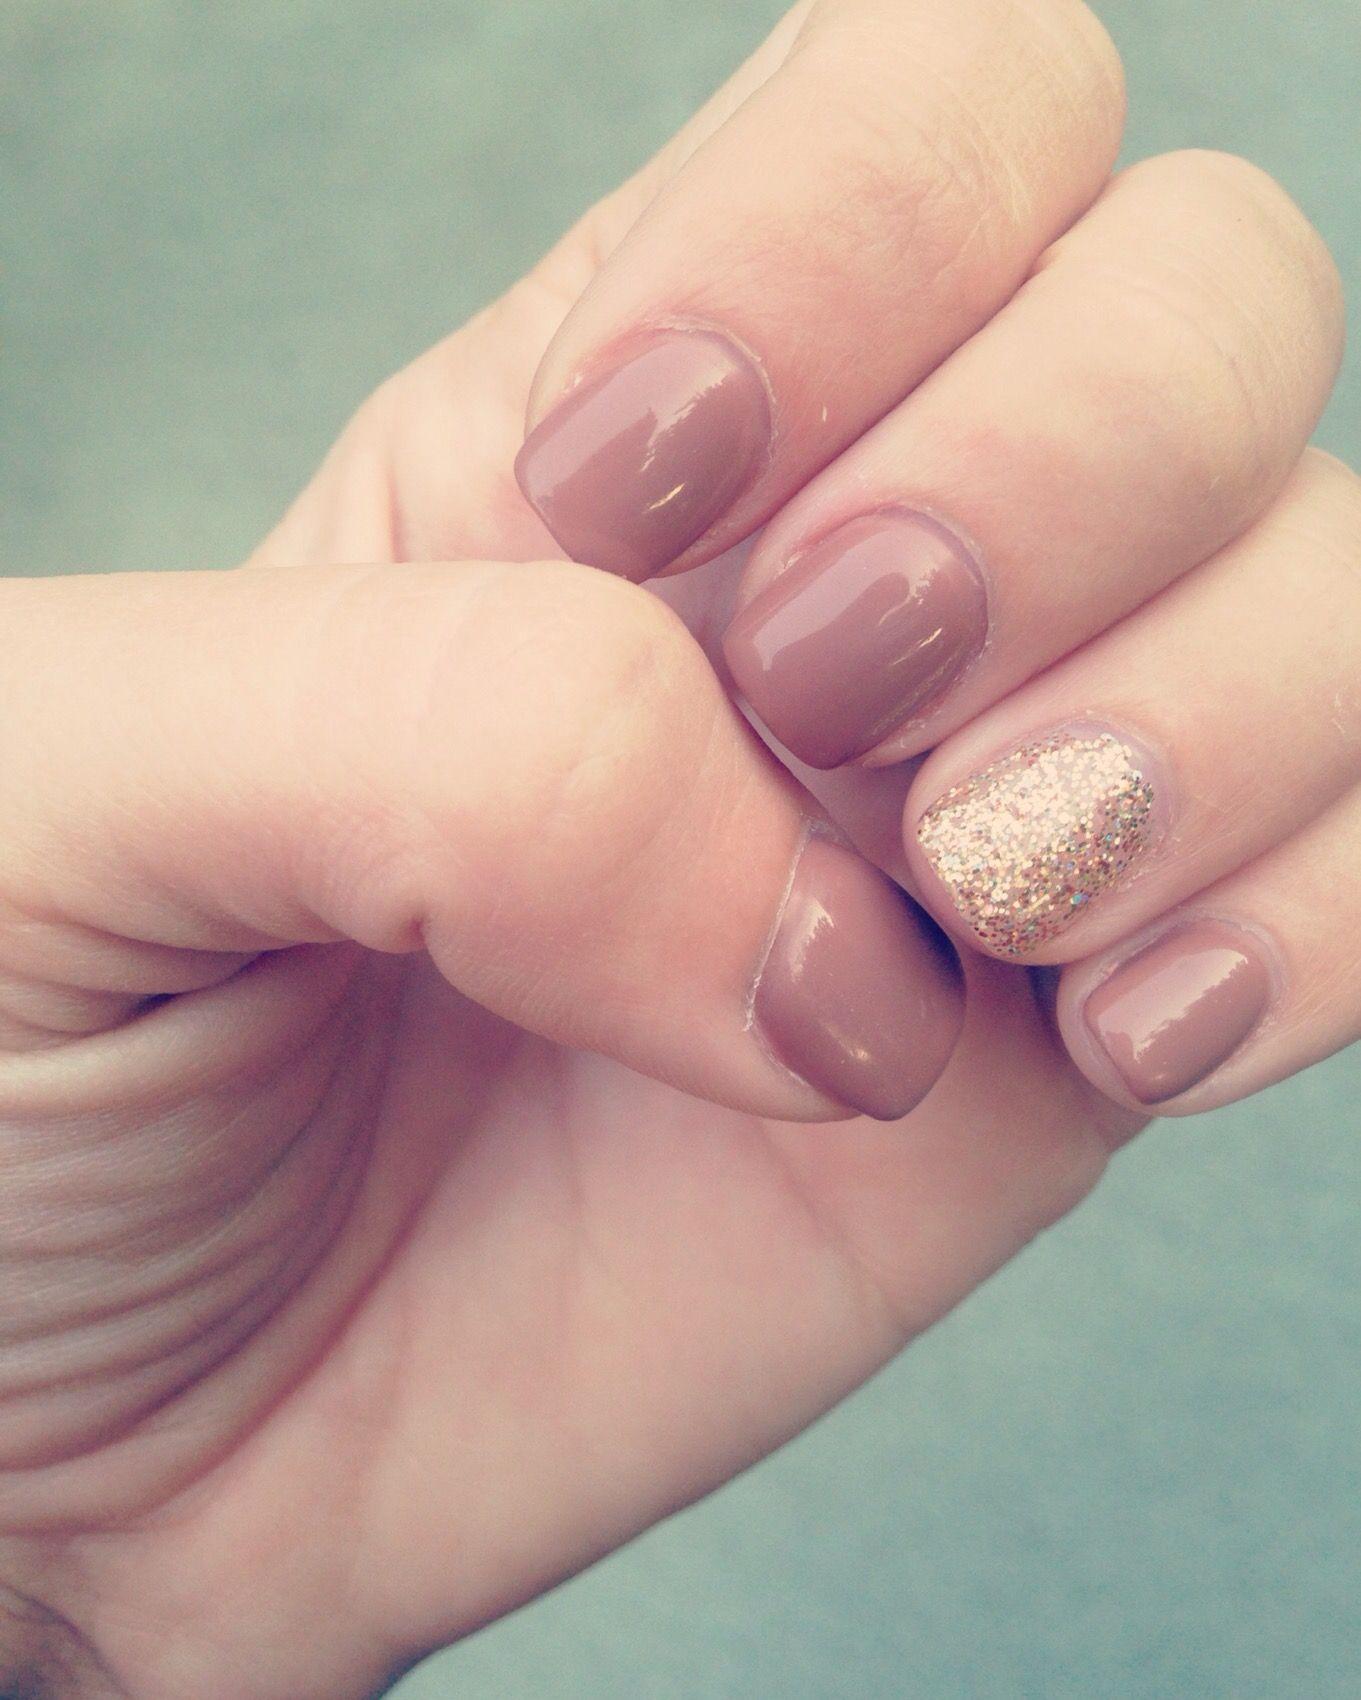 Tipsy Toes | Pinterest | Nail spa, Glitter nails and Gold glitter